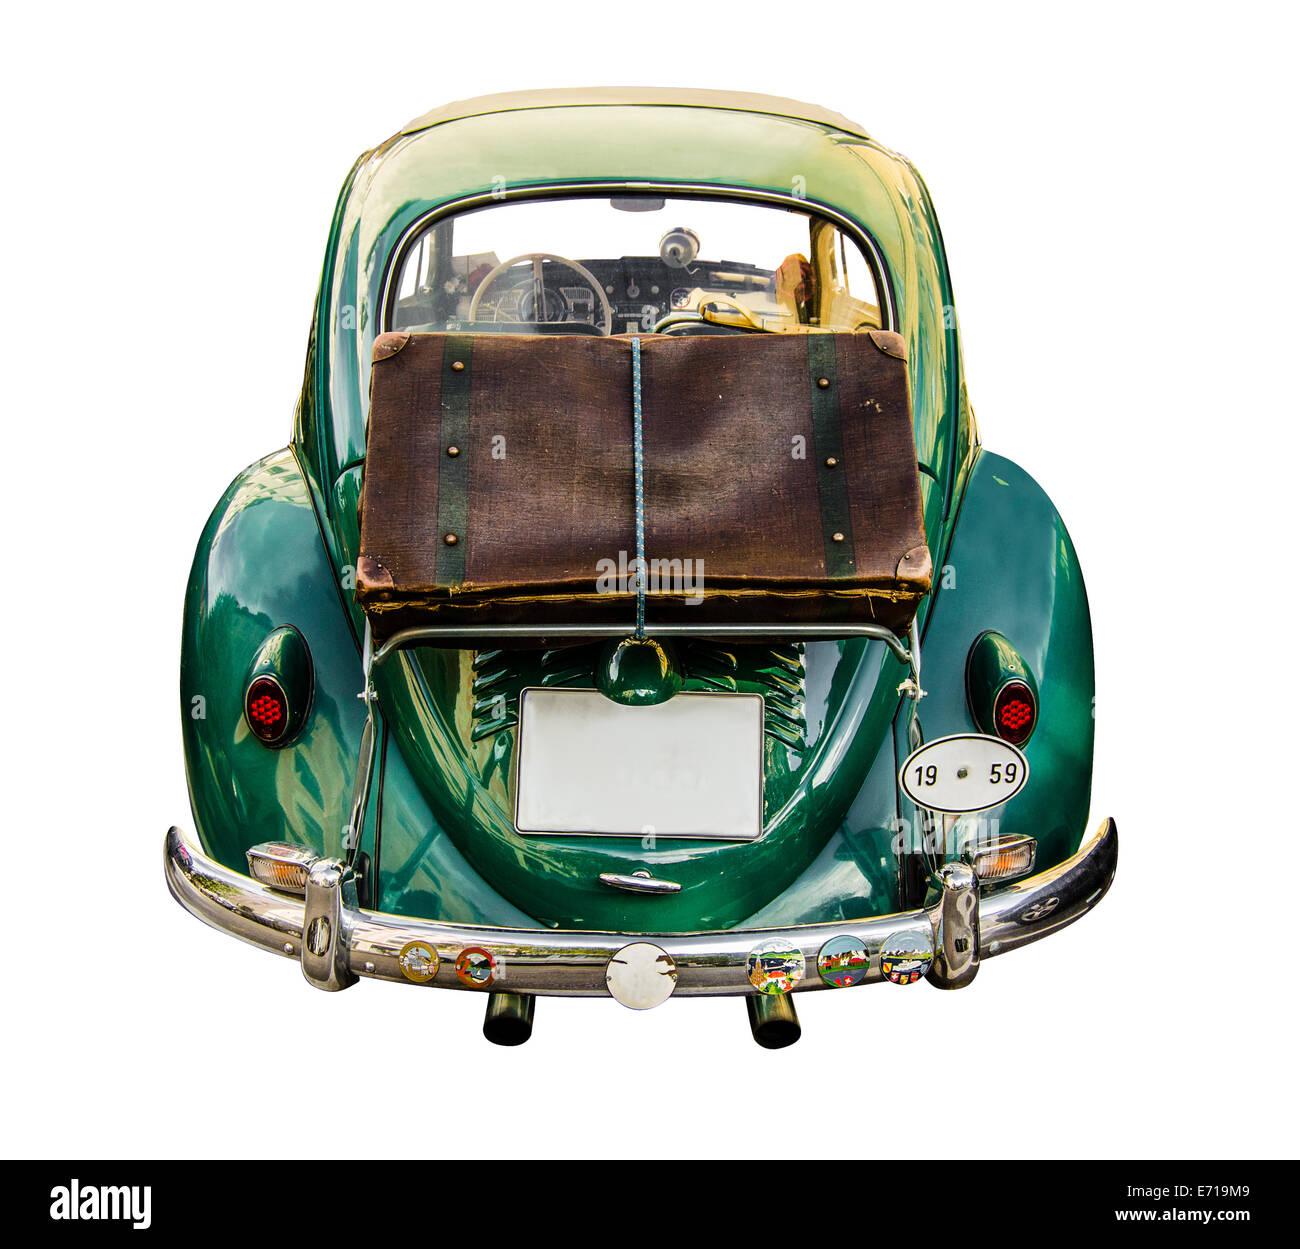 Vintage Car With Suitcase Luggage Stock Photo, Royalty Free Image ...